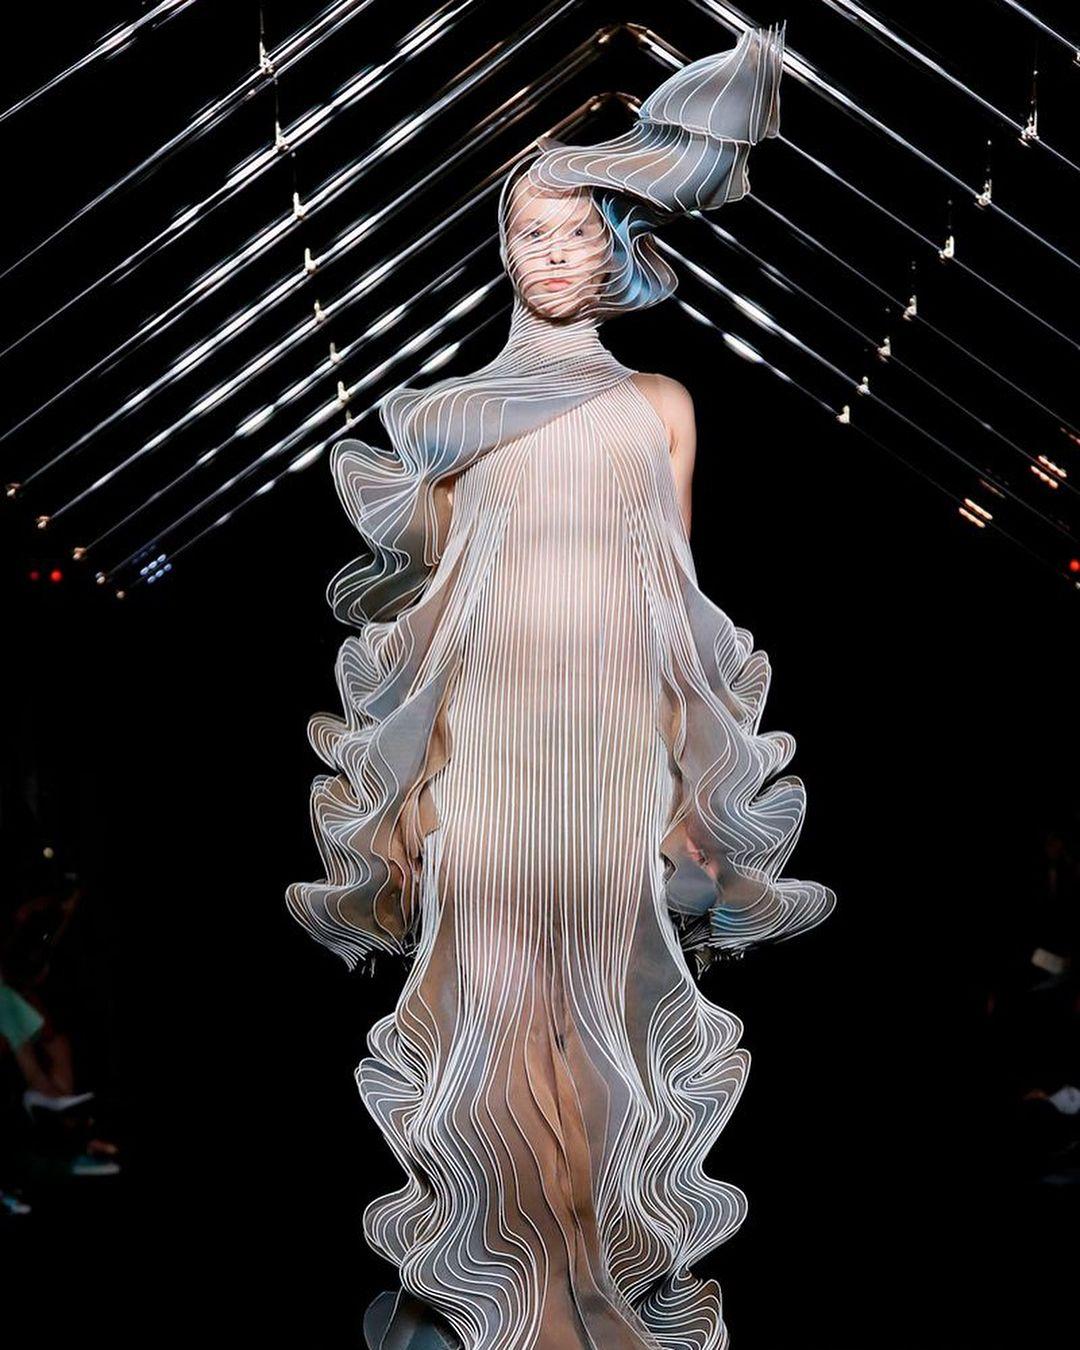 Iris Van Herpen Syntopia Parisfashionweek The Frozen Falls Gown And Headpiece Chronophotographic Lines Of Bird Wing Iris Van Herpen Fashion Dress Gift